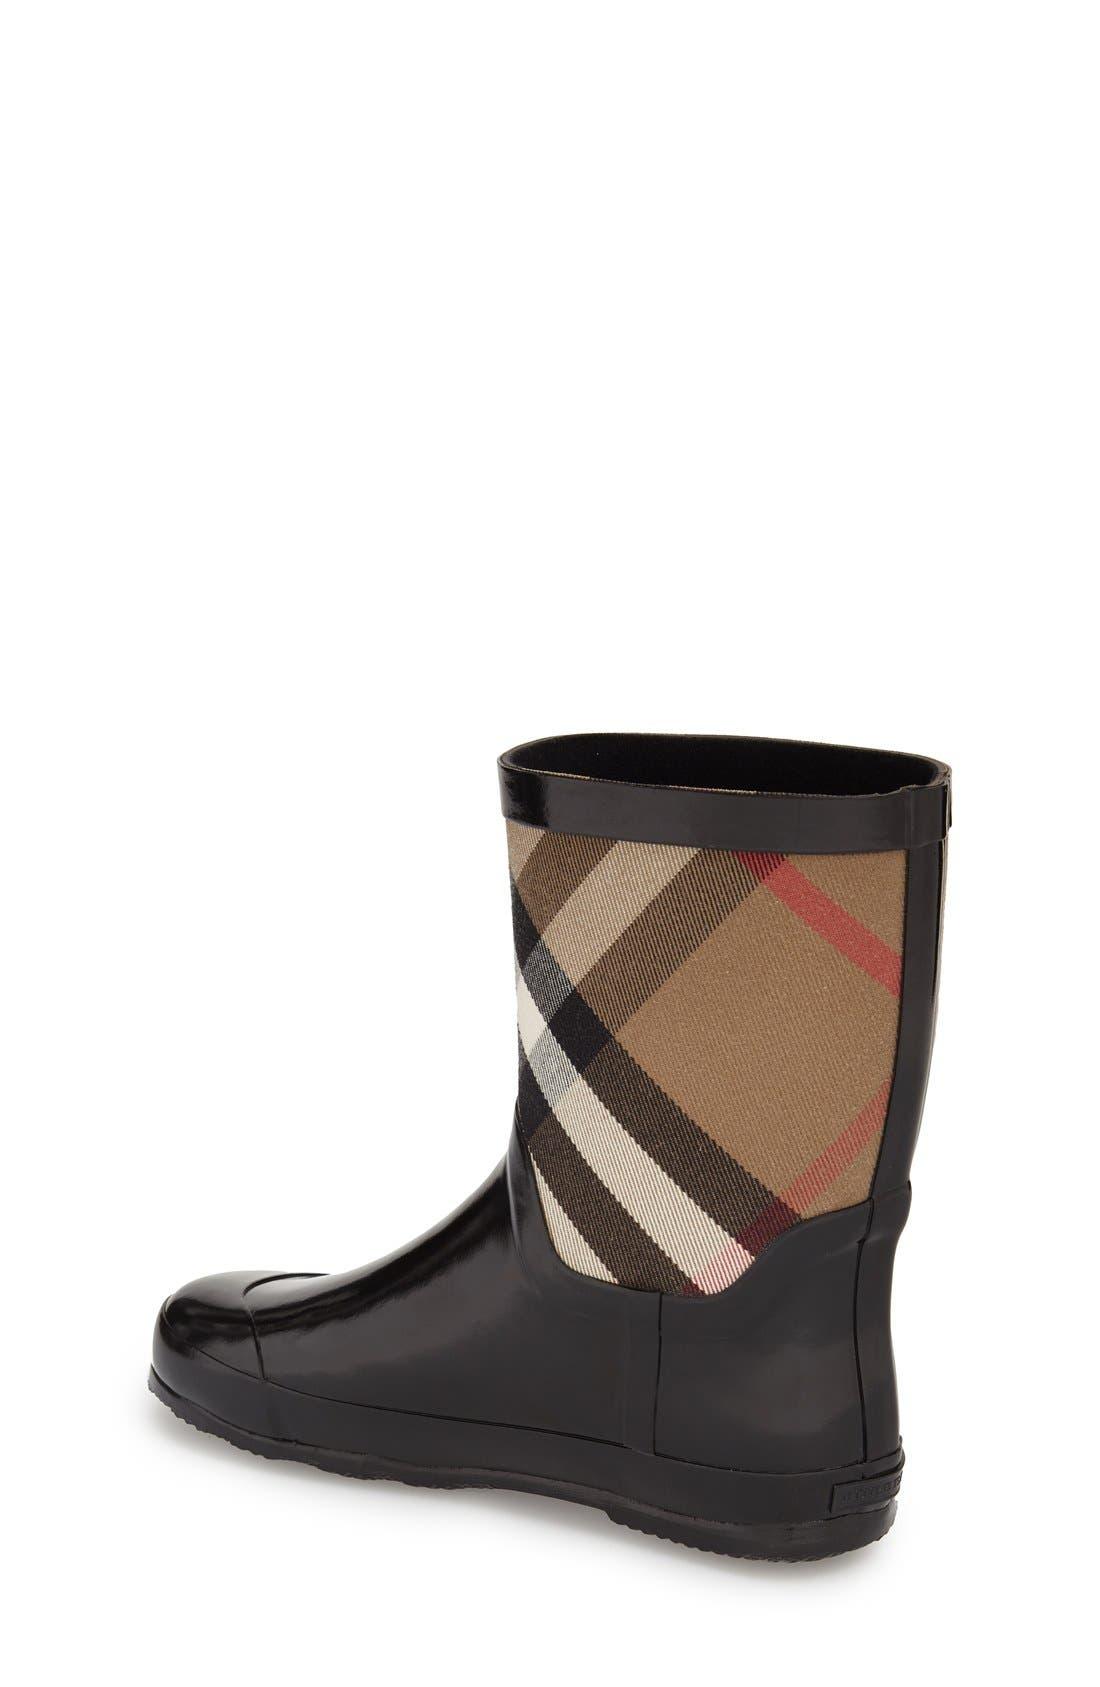 'Ranmoor' Waterproof Rain Boot,                             Alternate thumbnail 11, color,